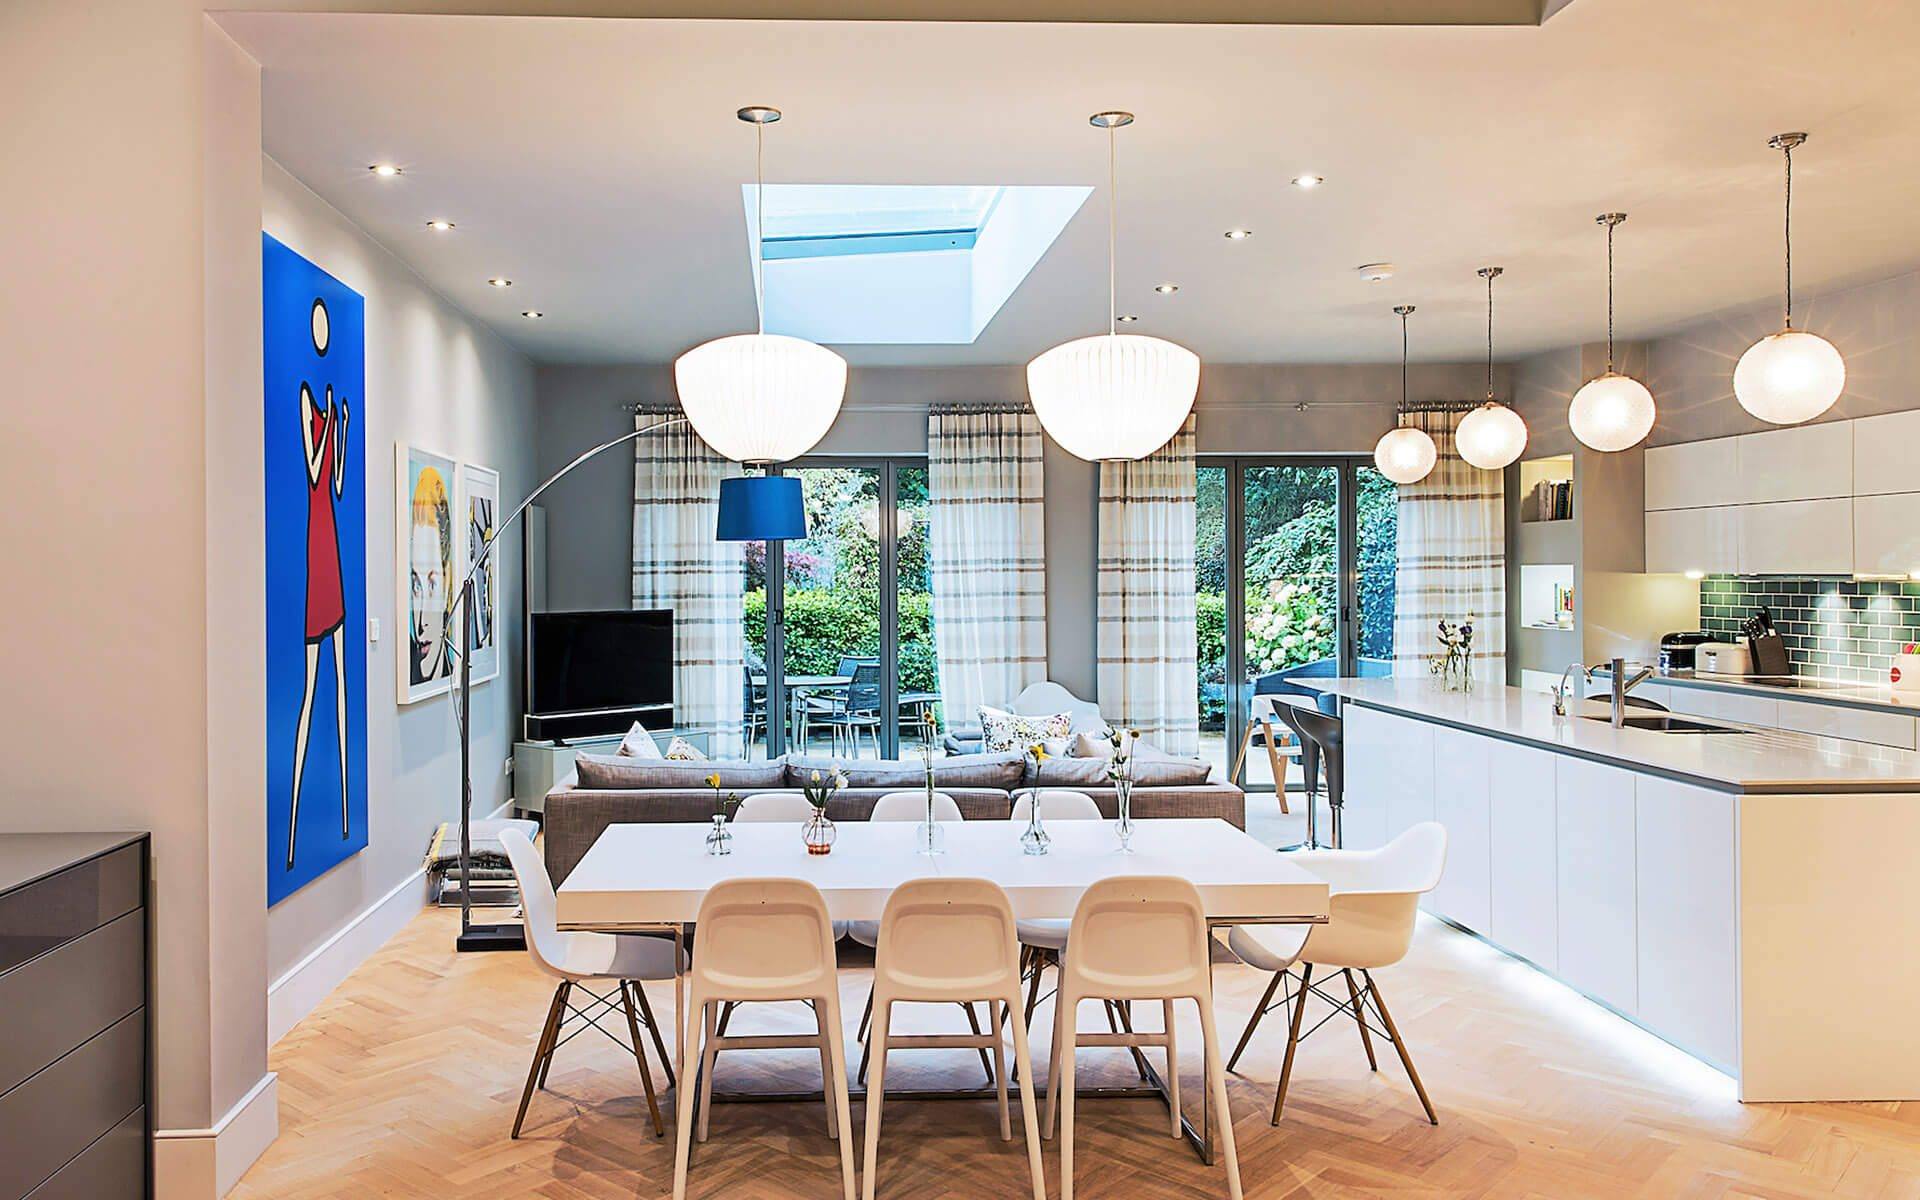 Godrich-Interiors-Routh-Road-SW18-Kitchen-open-plan